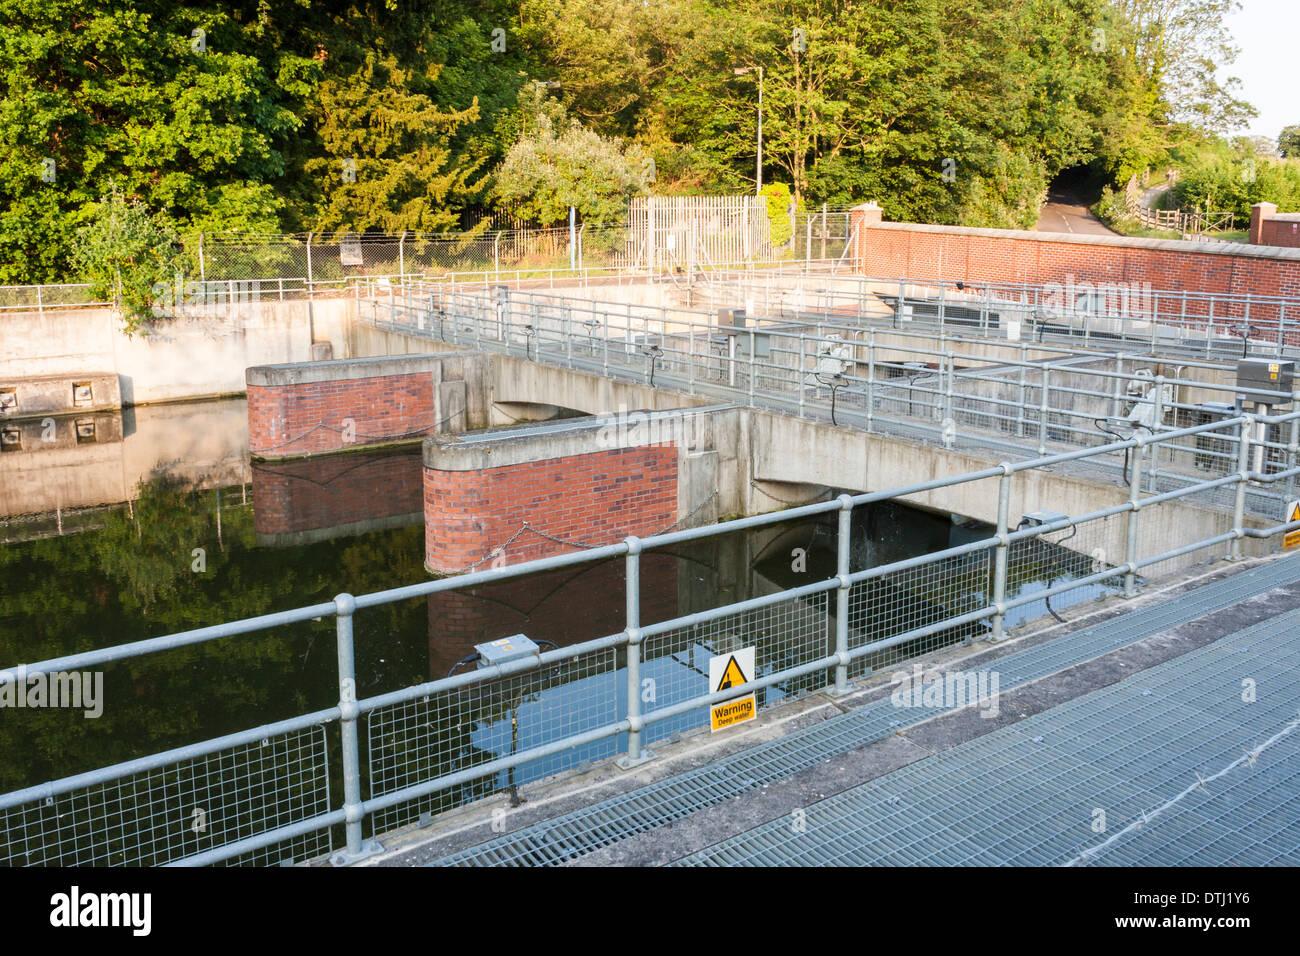 Jubilee River: a man-made flood prevention scheme. Taplow, Buckinghamshire, England, GB, UK. - Stock Image